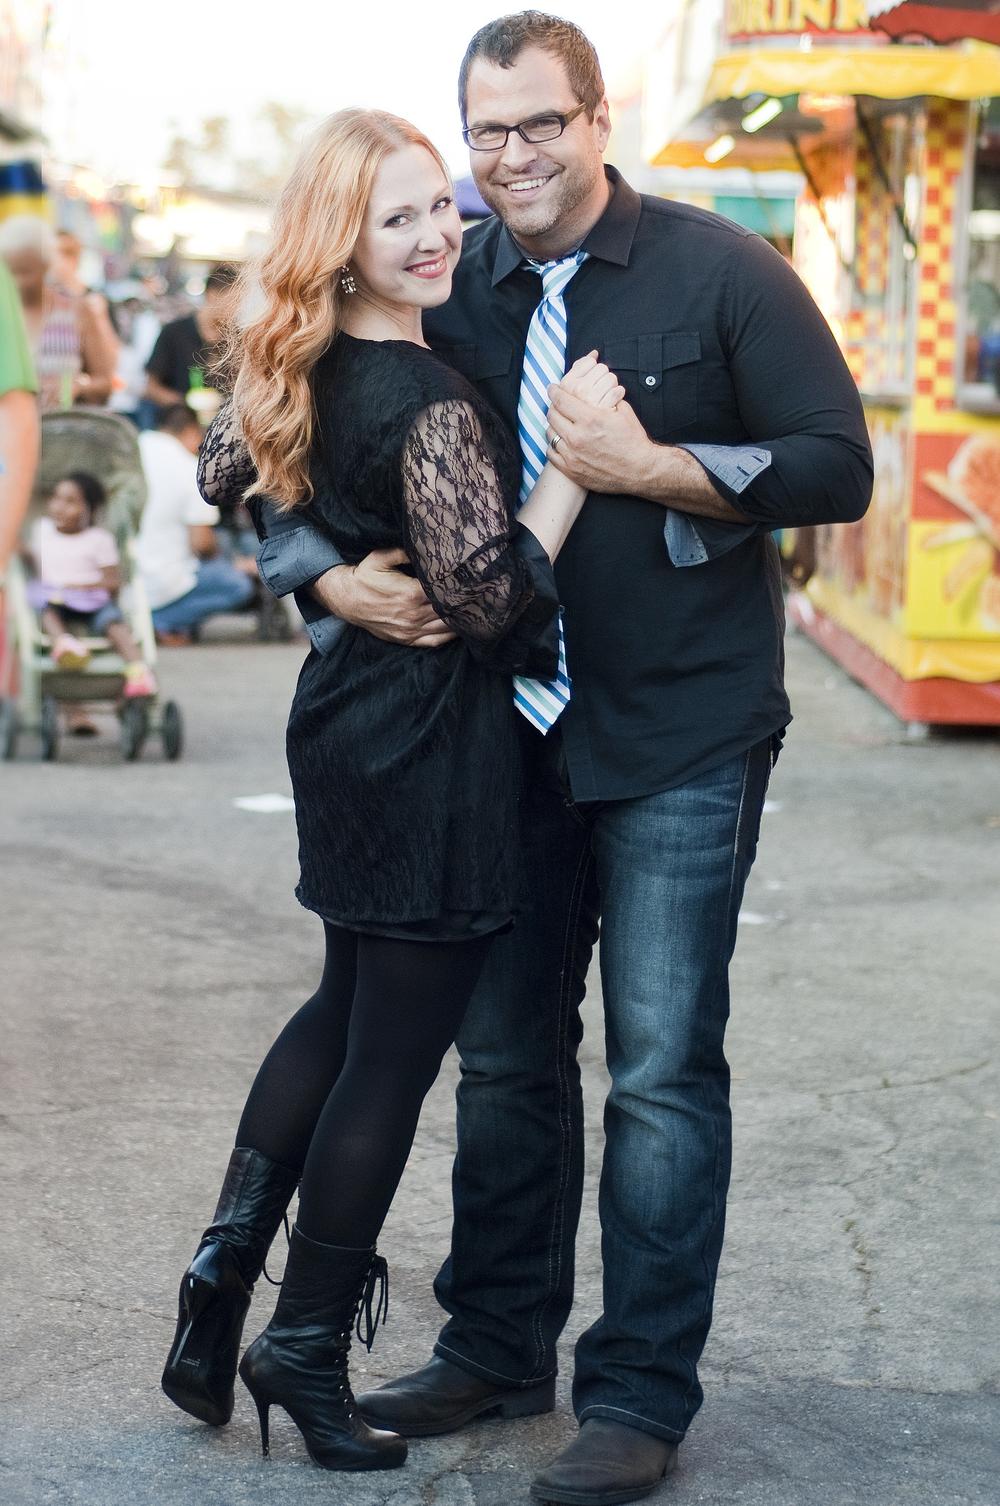 Rob and Evangeline